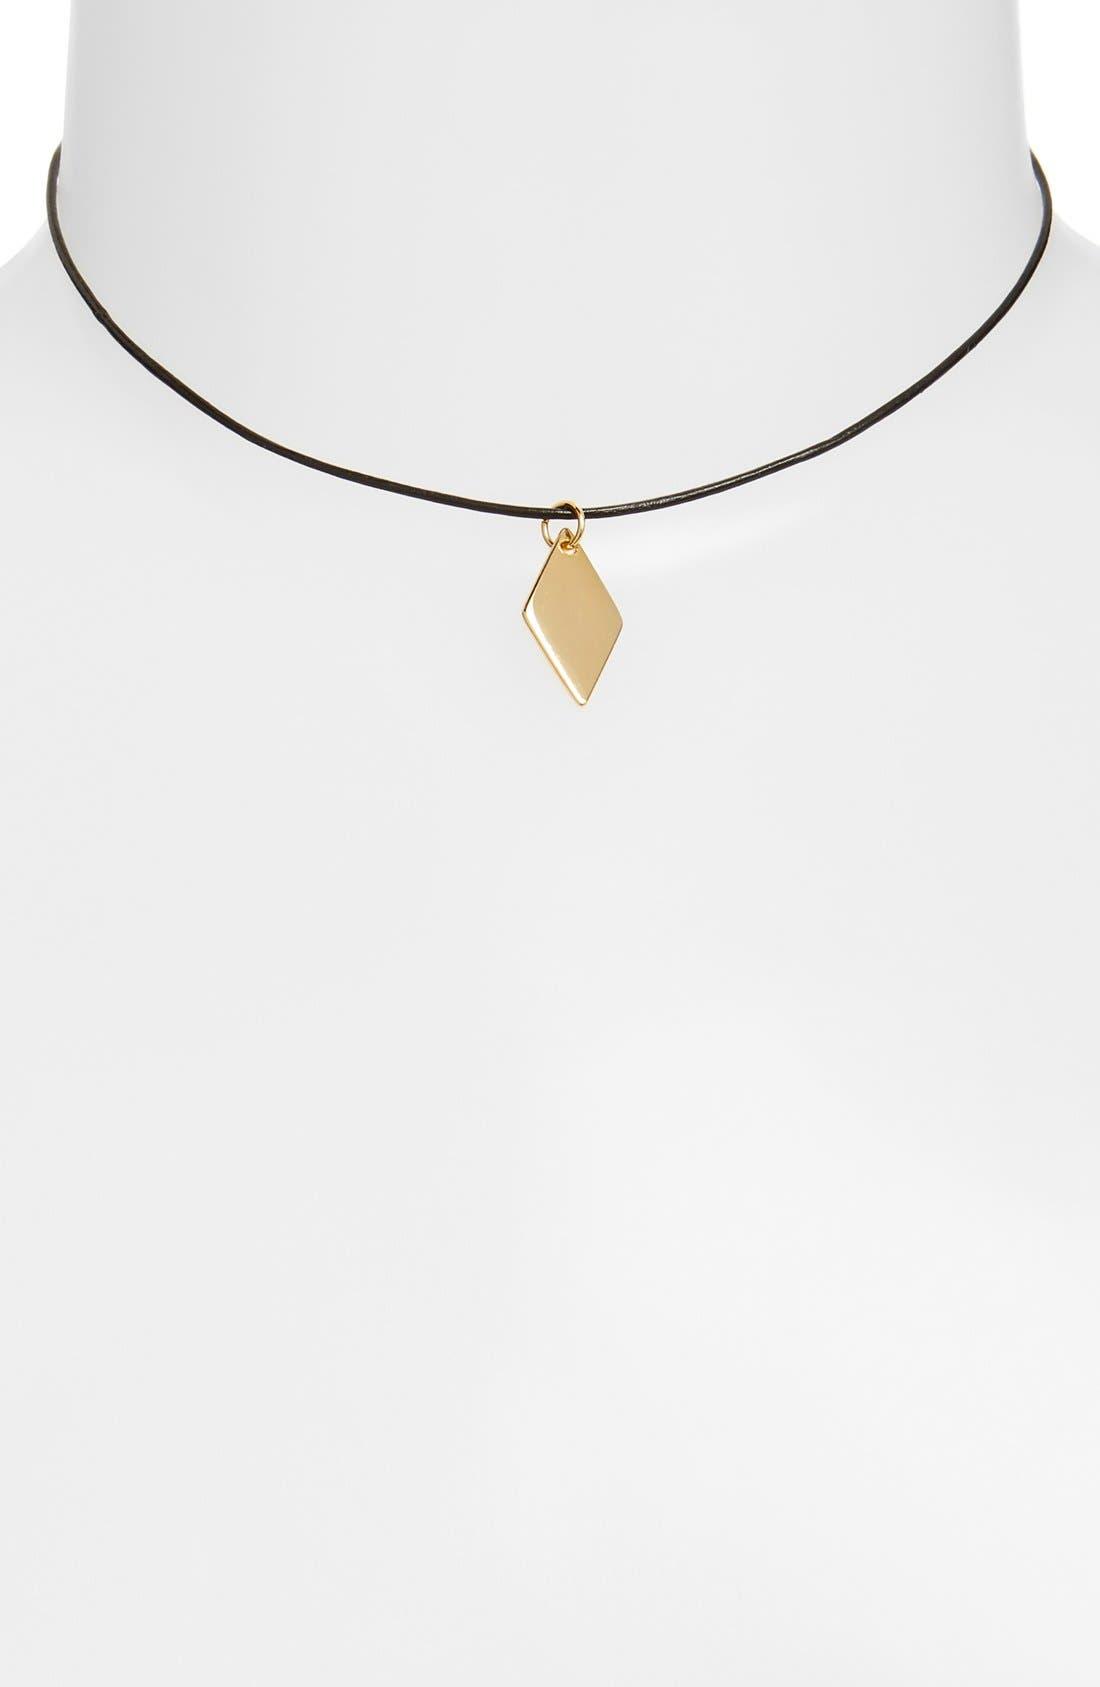 Alternate Image 1 Selected - Vanessa Mooney Geometric Charm Leather Choker